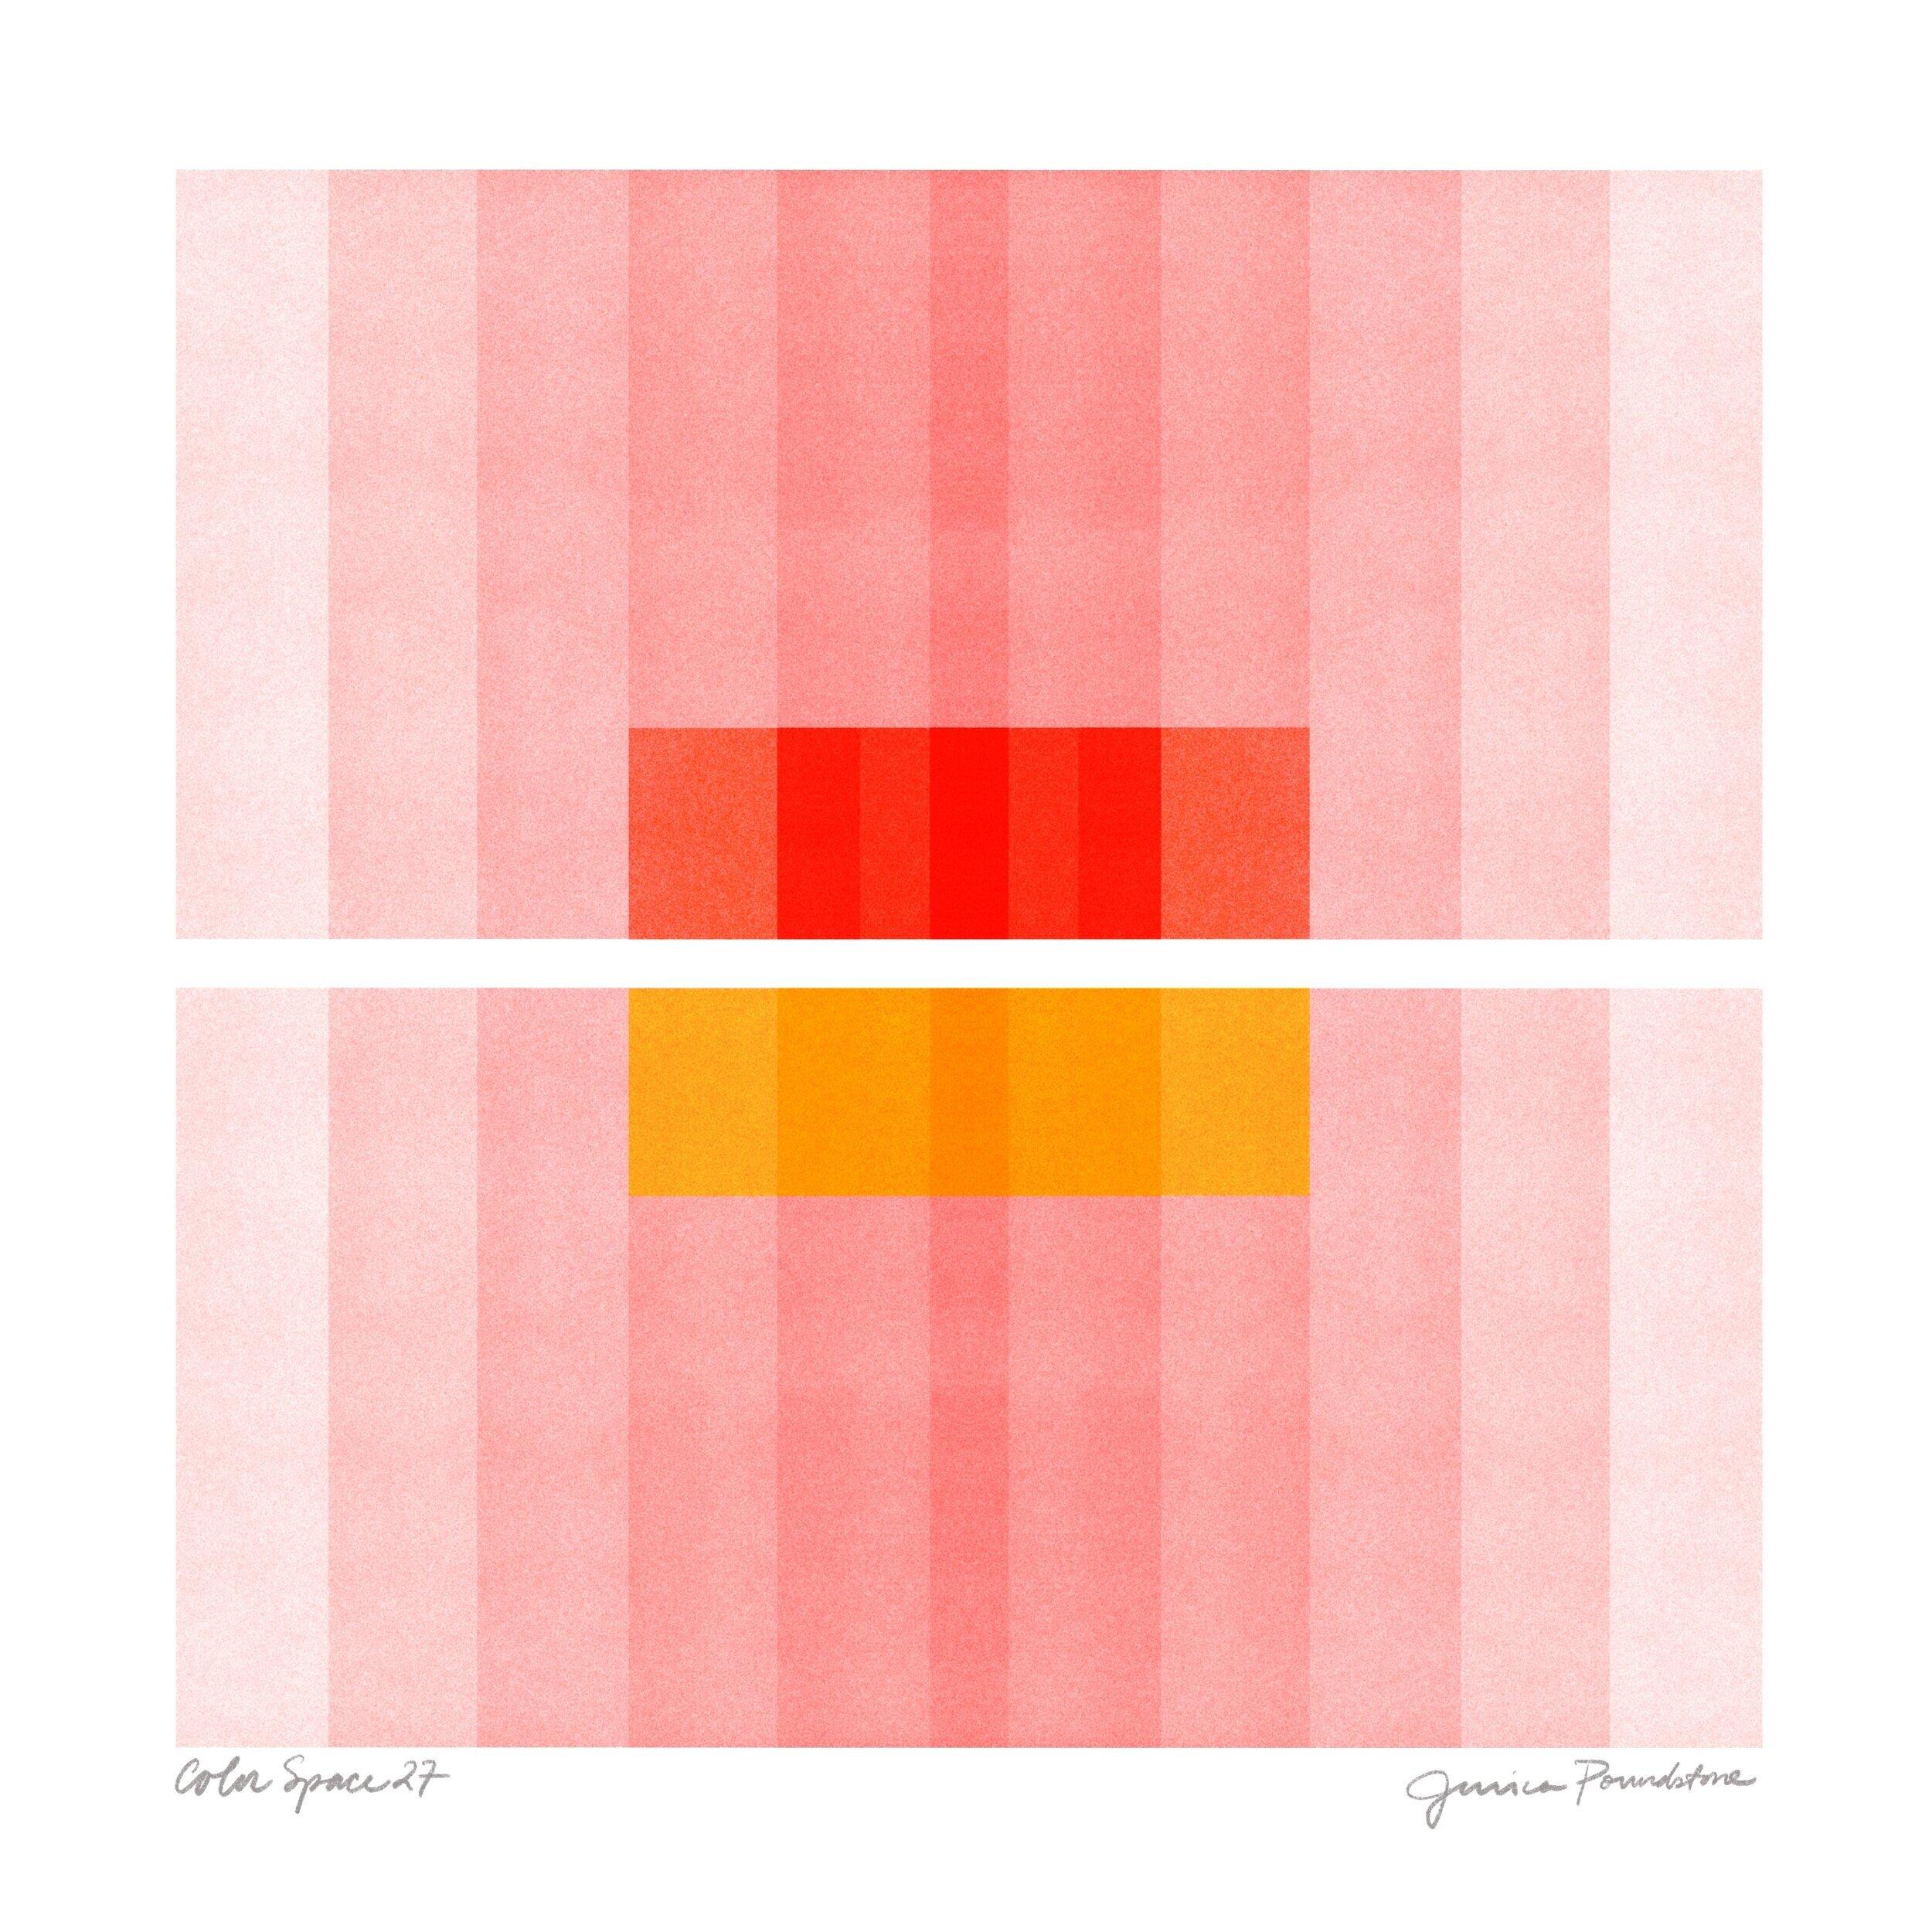 Color Space 27